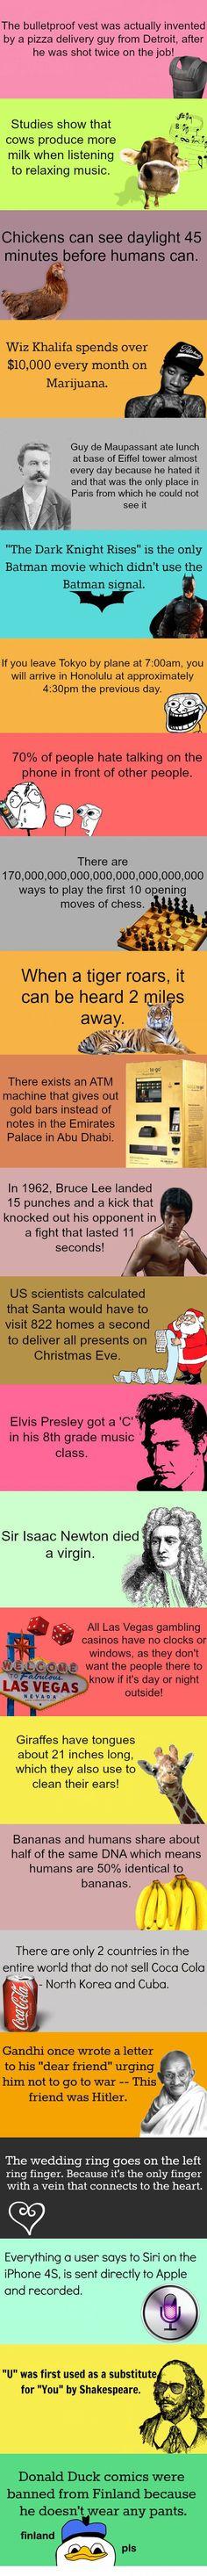 Haha Santa must be REALLLY fast!! It's almost like magic!! ;)